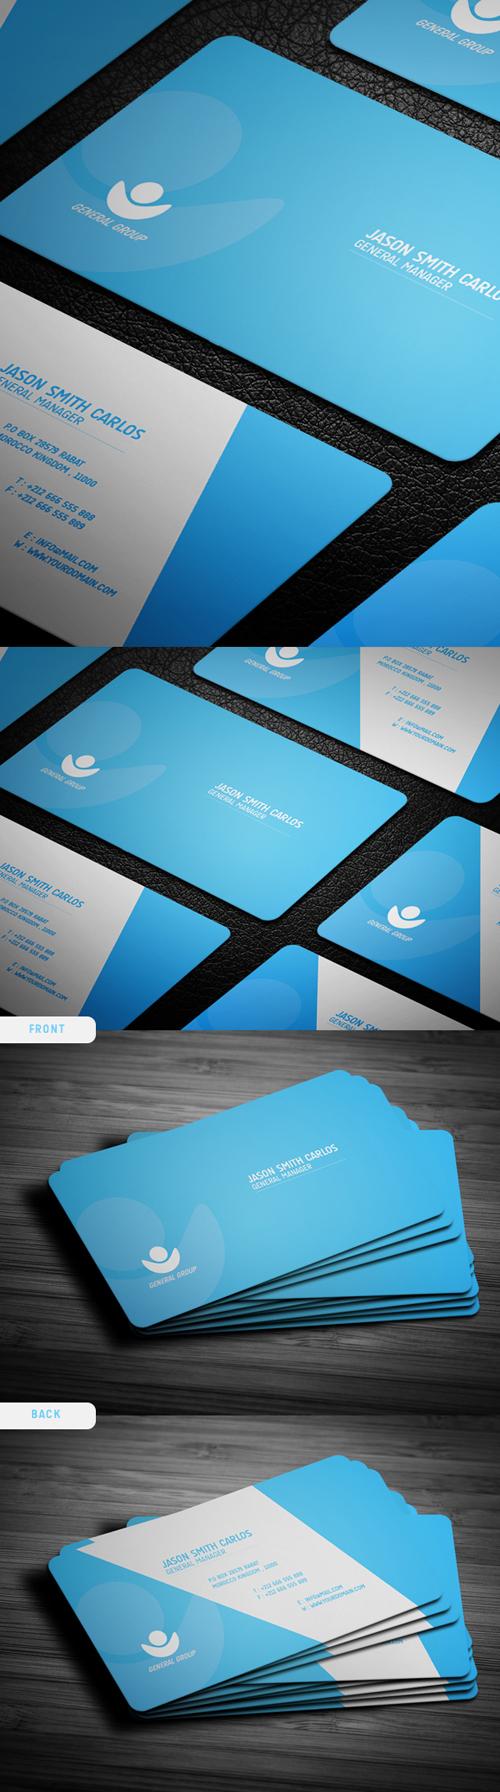 business cards template design - 12